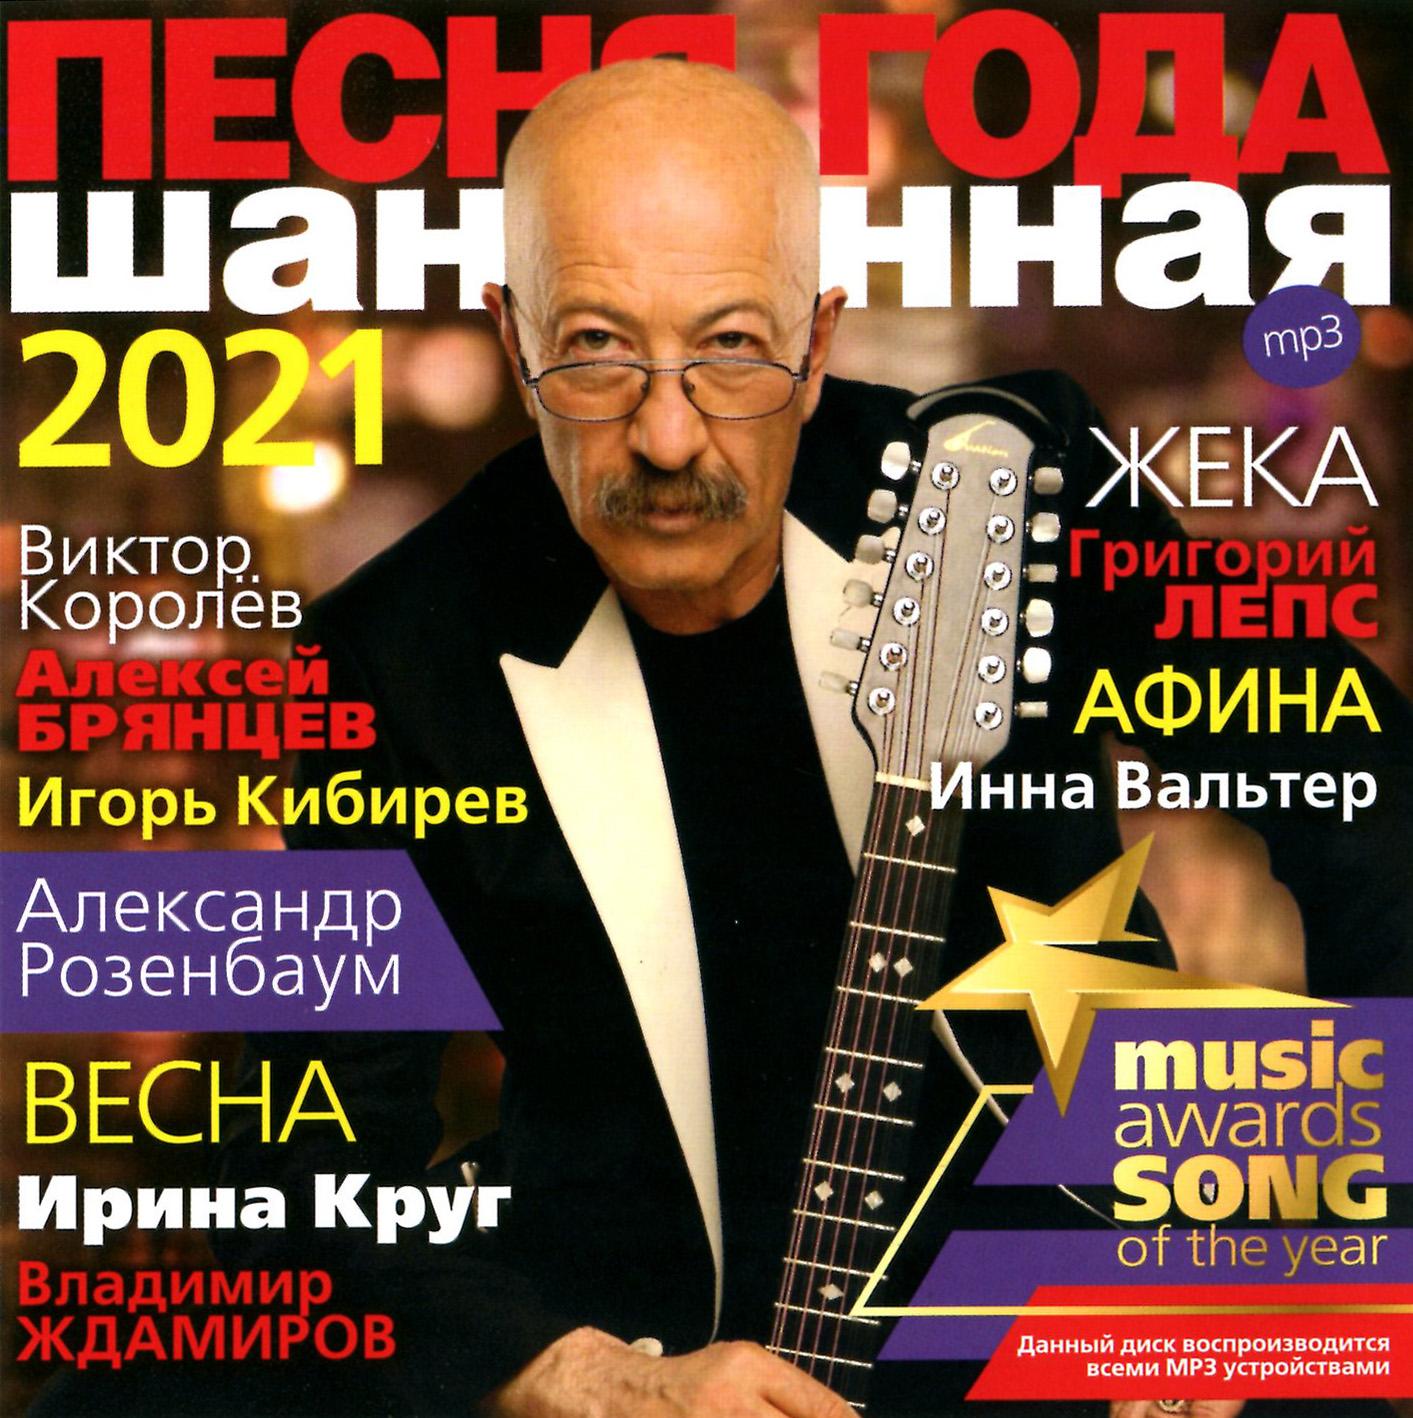 ПЕСНЯ ГОДА – 2021 шансонная [mp3]